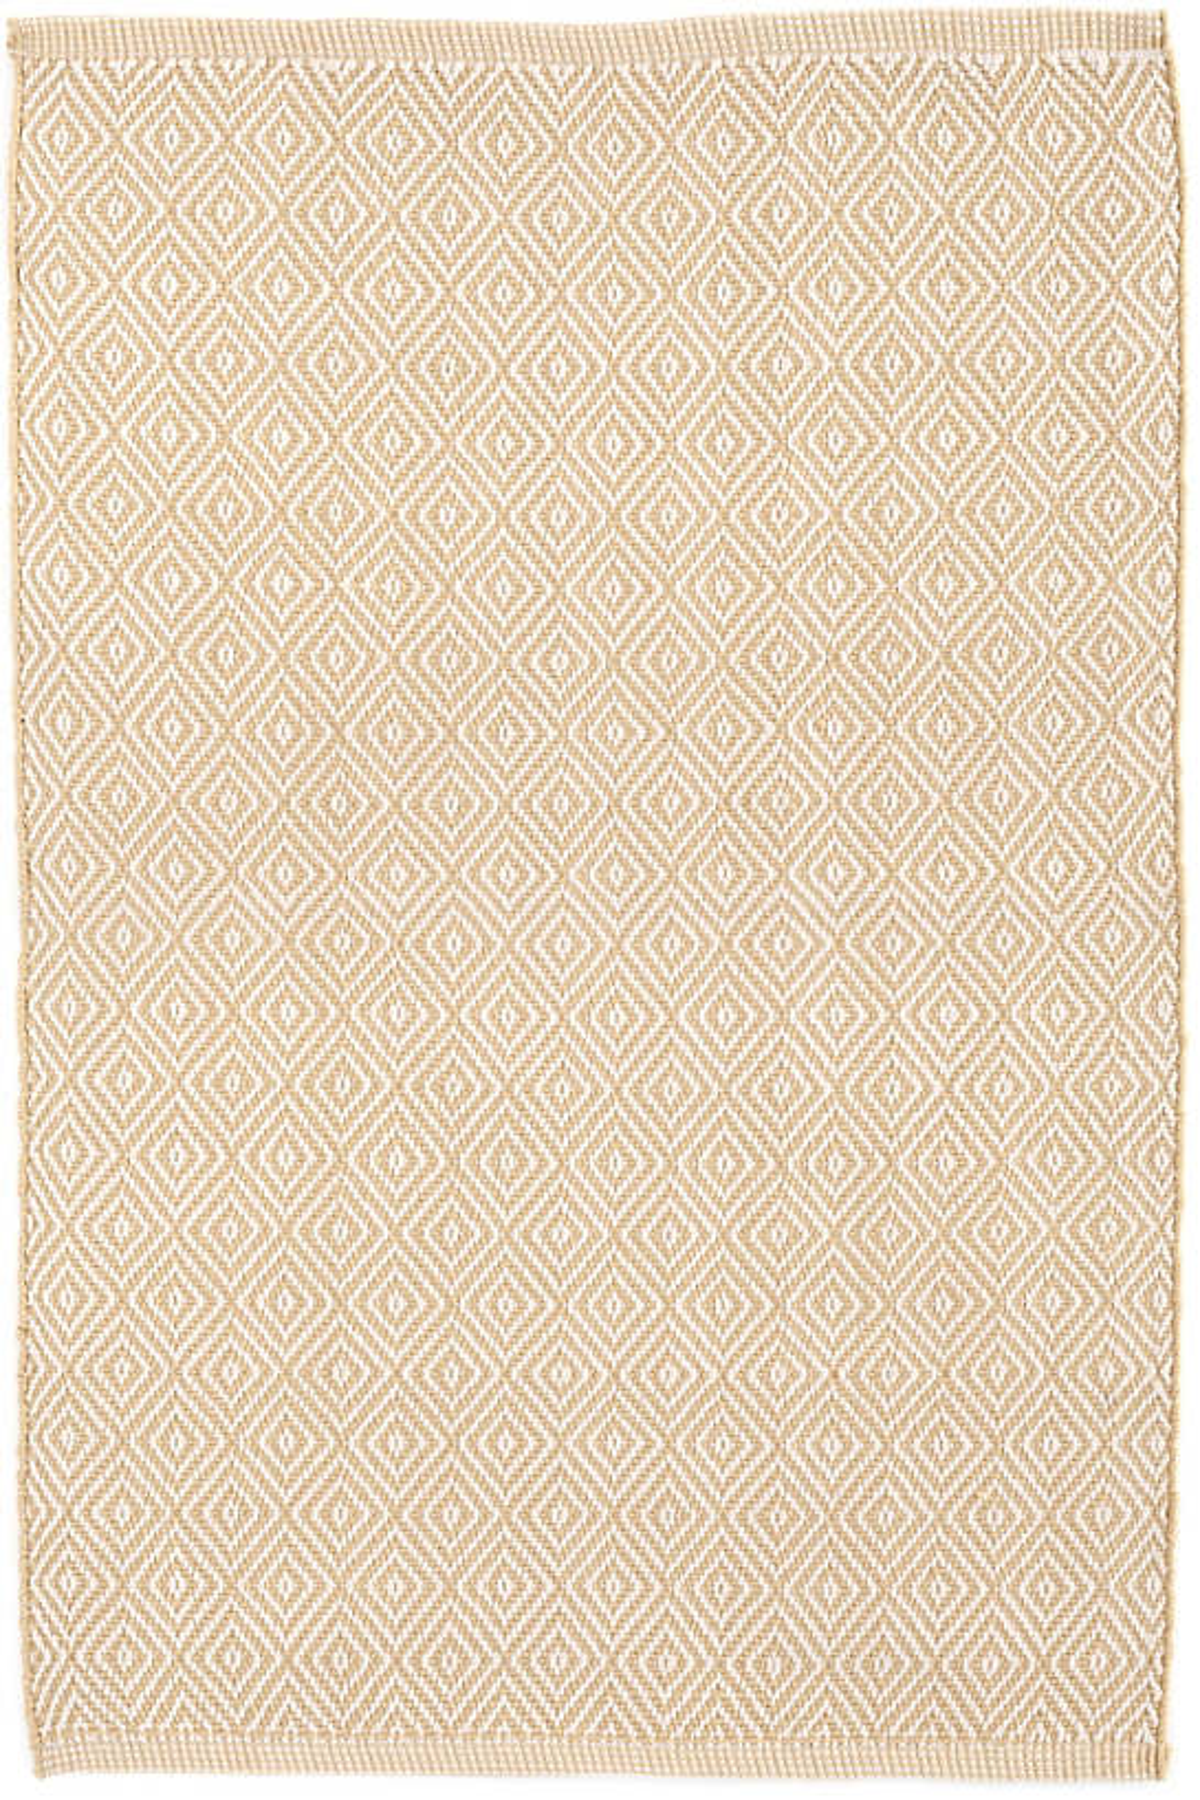 Petit Diamond Wheat/Ivory Indoor/Outdoor Rug